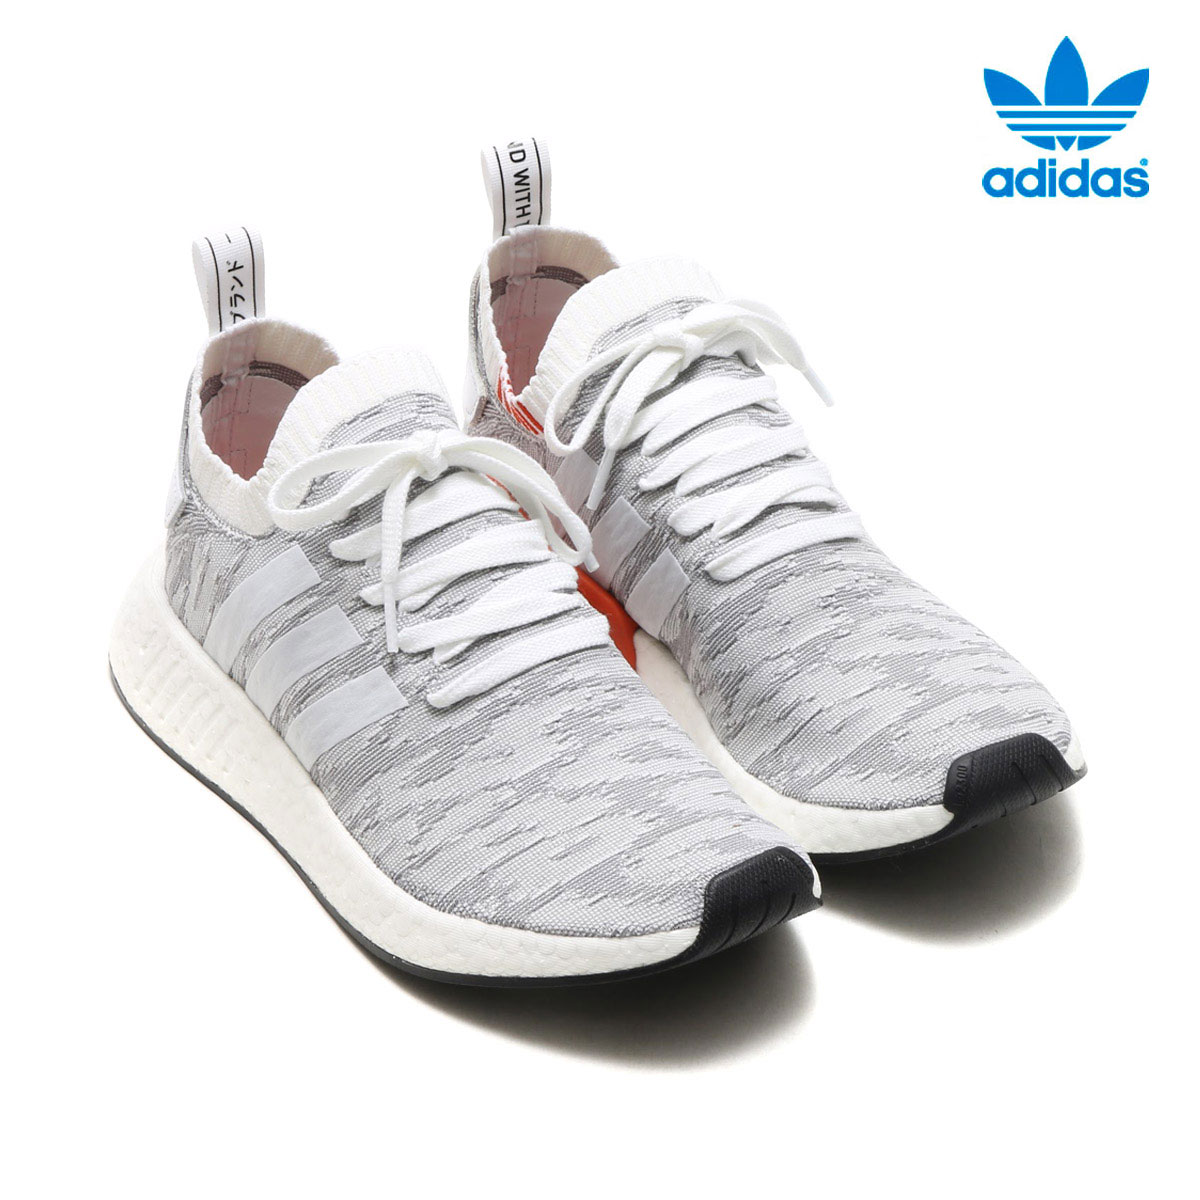 adidas Originals NMD CS2 PK(アディダス オリジナルス ノマド)(RUNNING WHITE/RUNNING WHITE)【メンズ】17FW-I